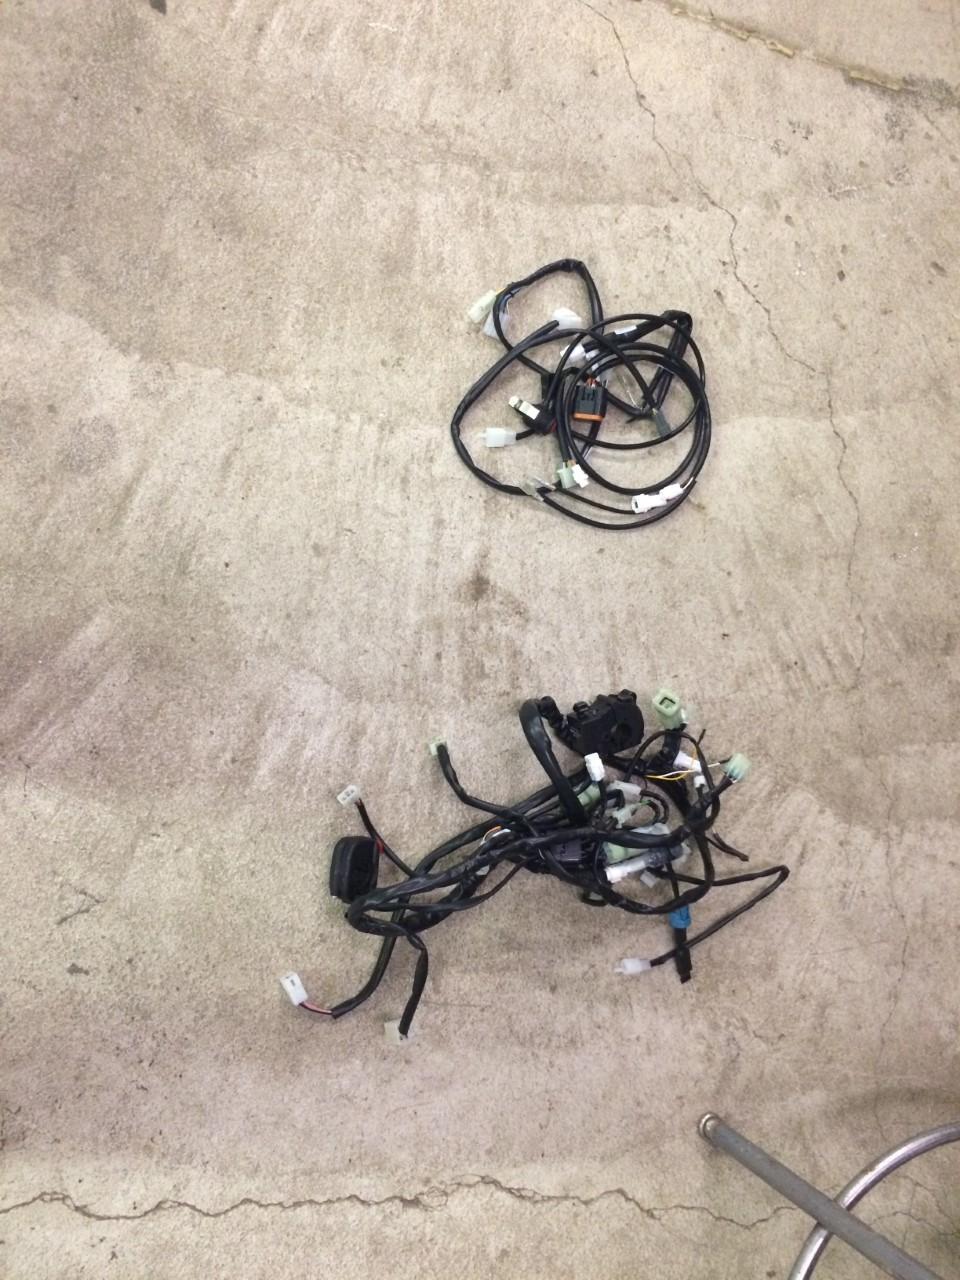 14-wiring-harness